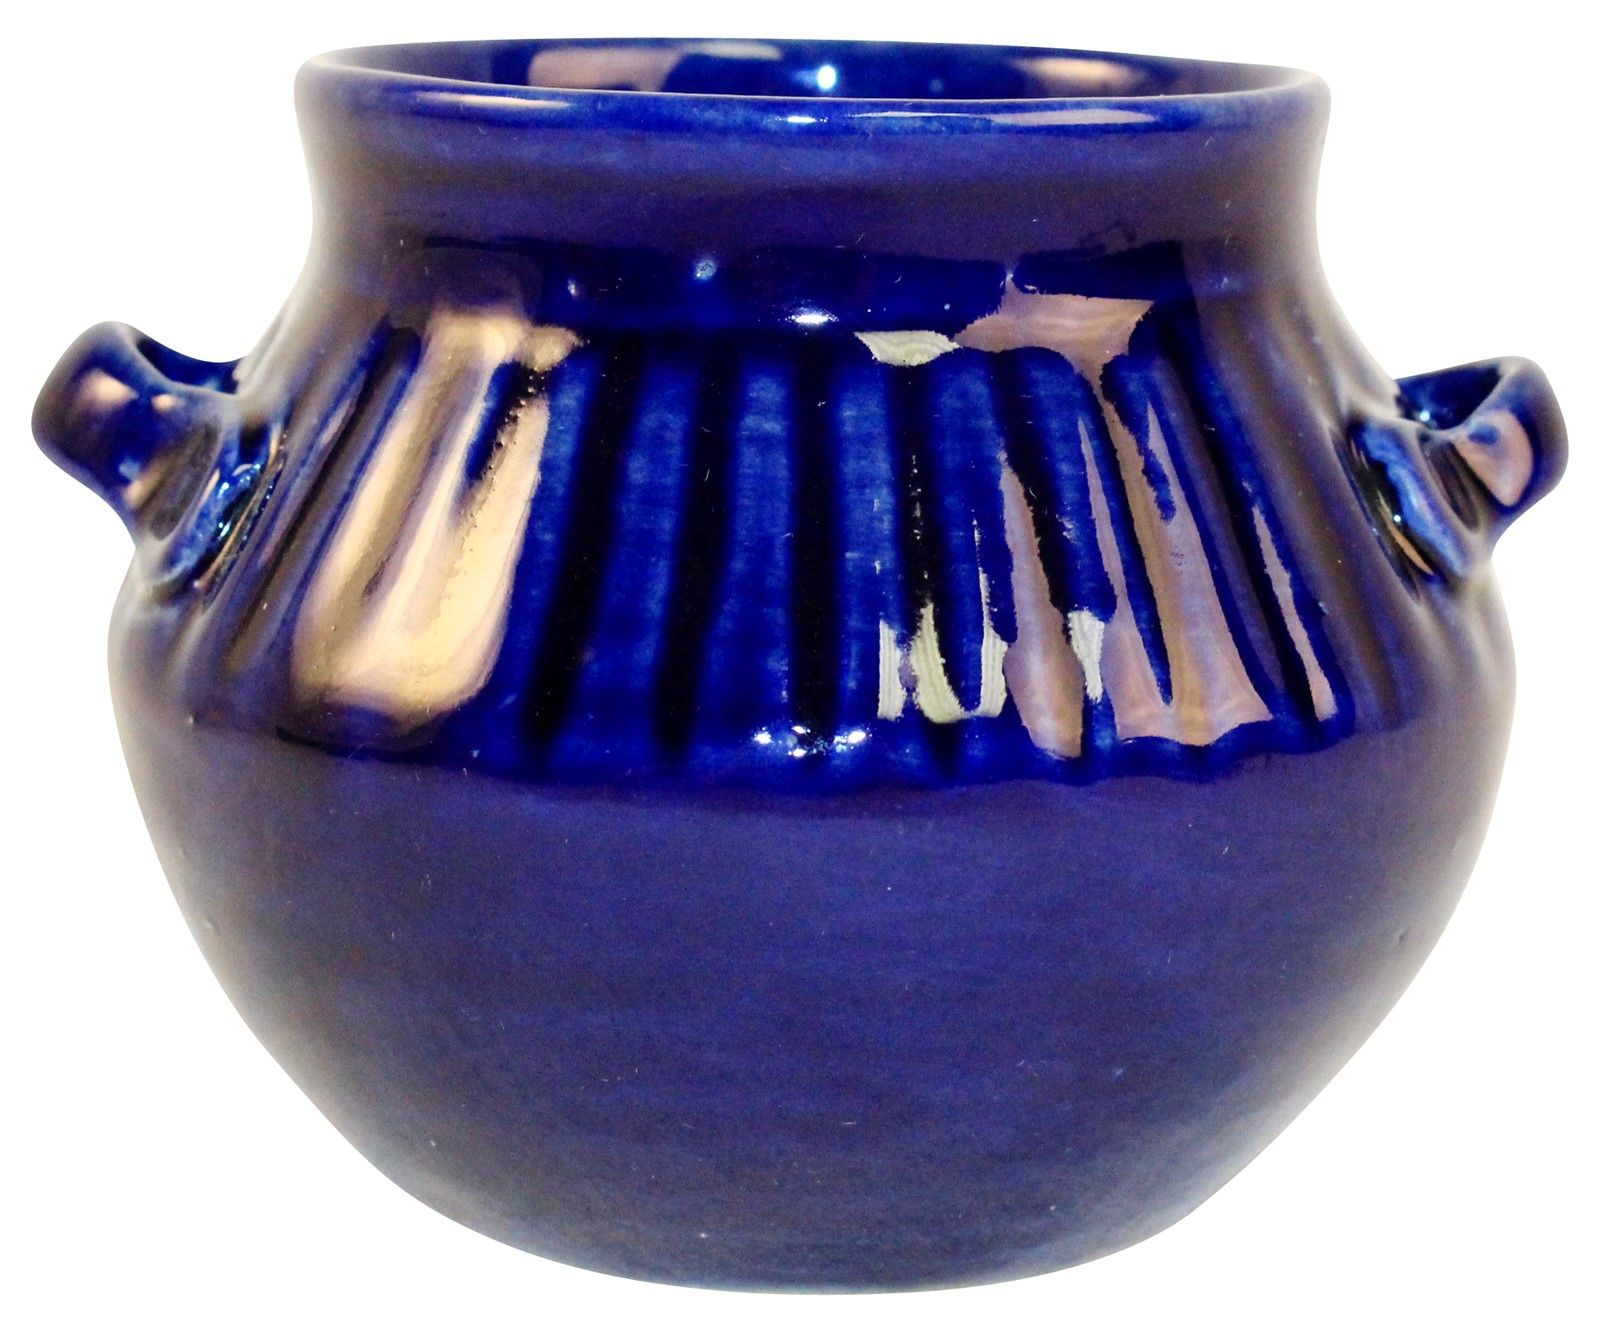 Van briggle pottery original hand thrown cobalt blue handled vase van briggle pottery original hand thrown cobalt blue handled vase wills reviewsmspy